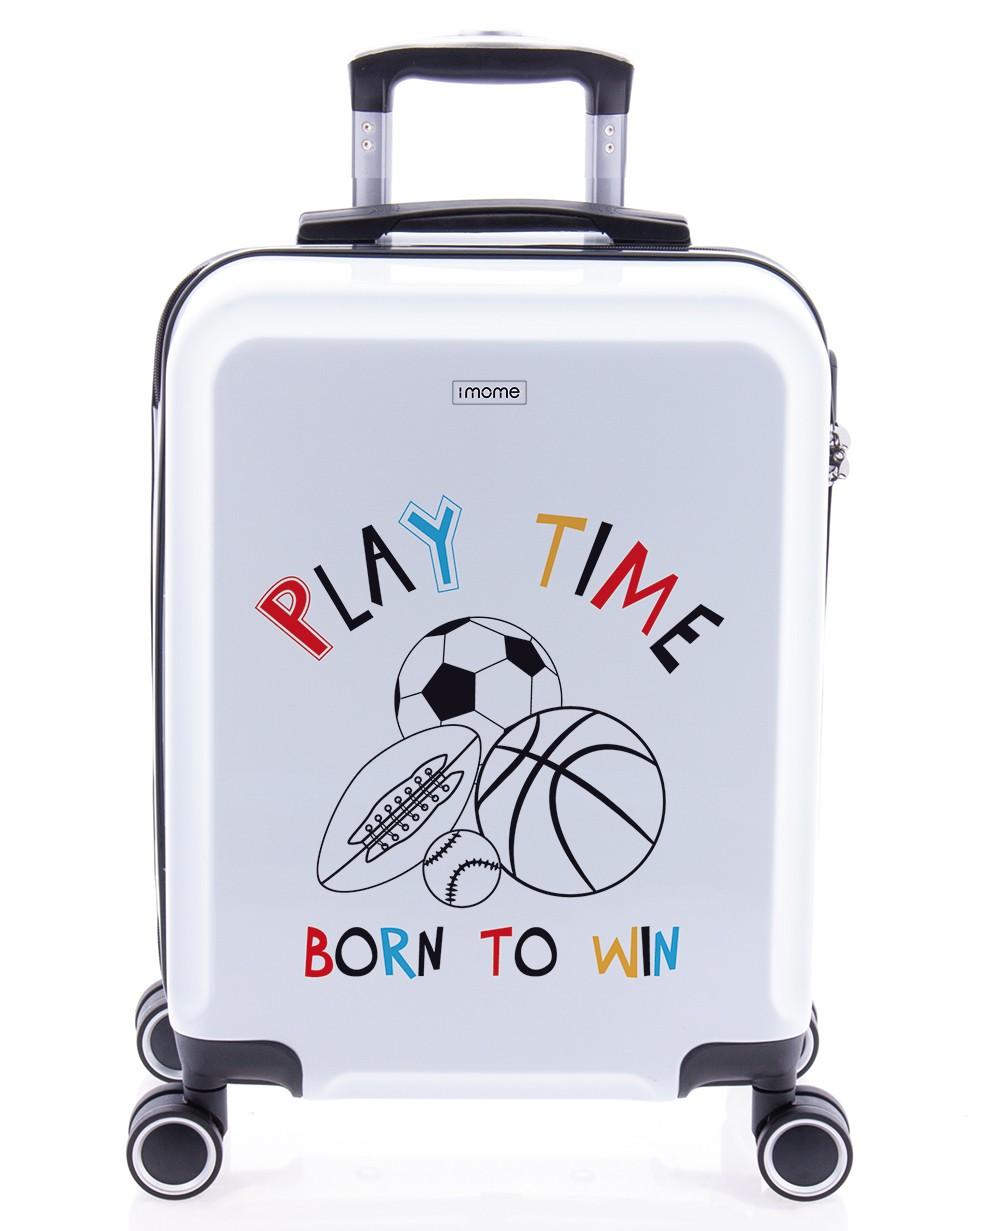 imome Cool Maleta de mano Play Time Deportes (Foto )